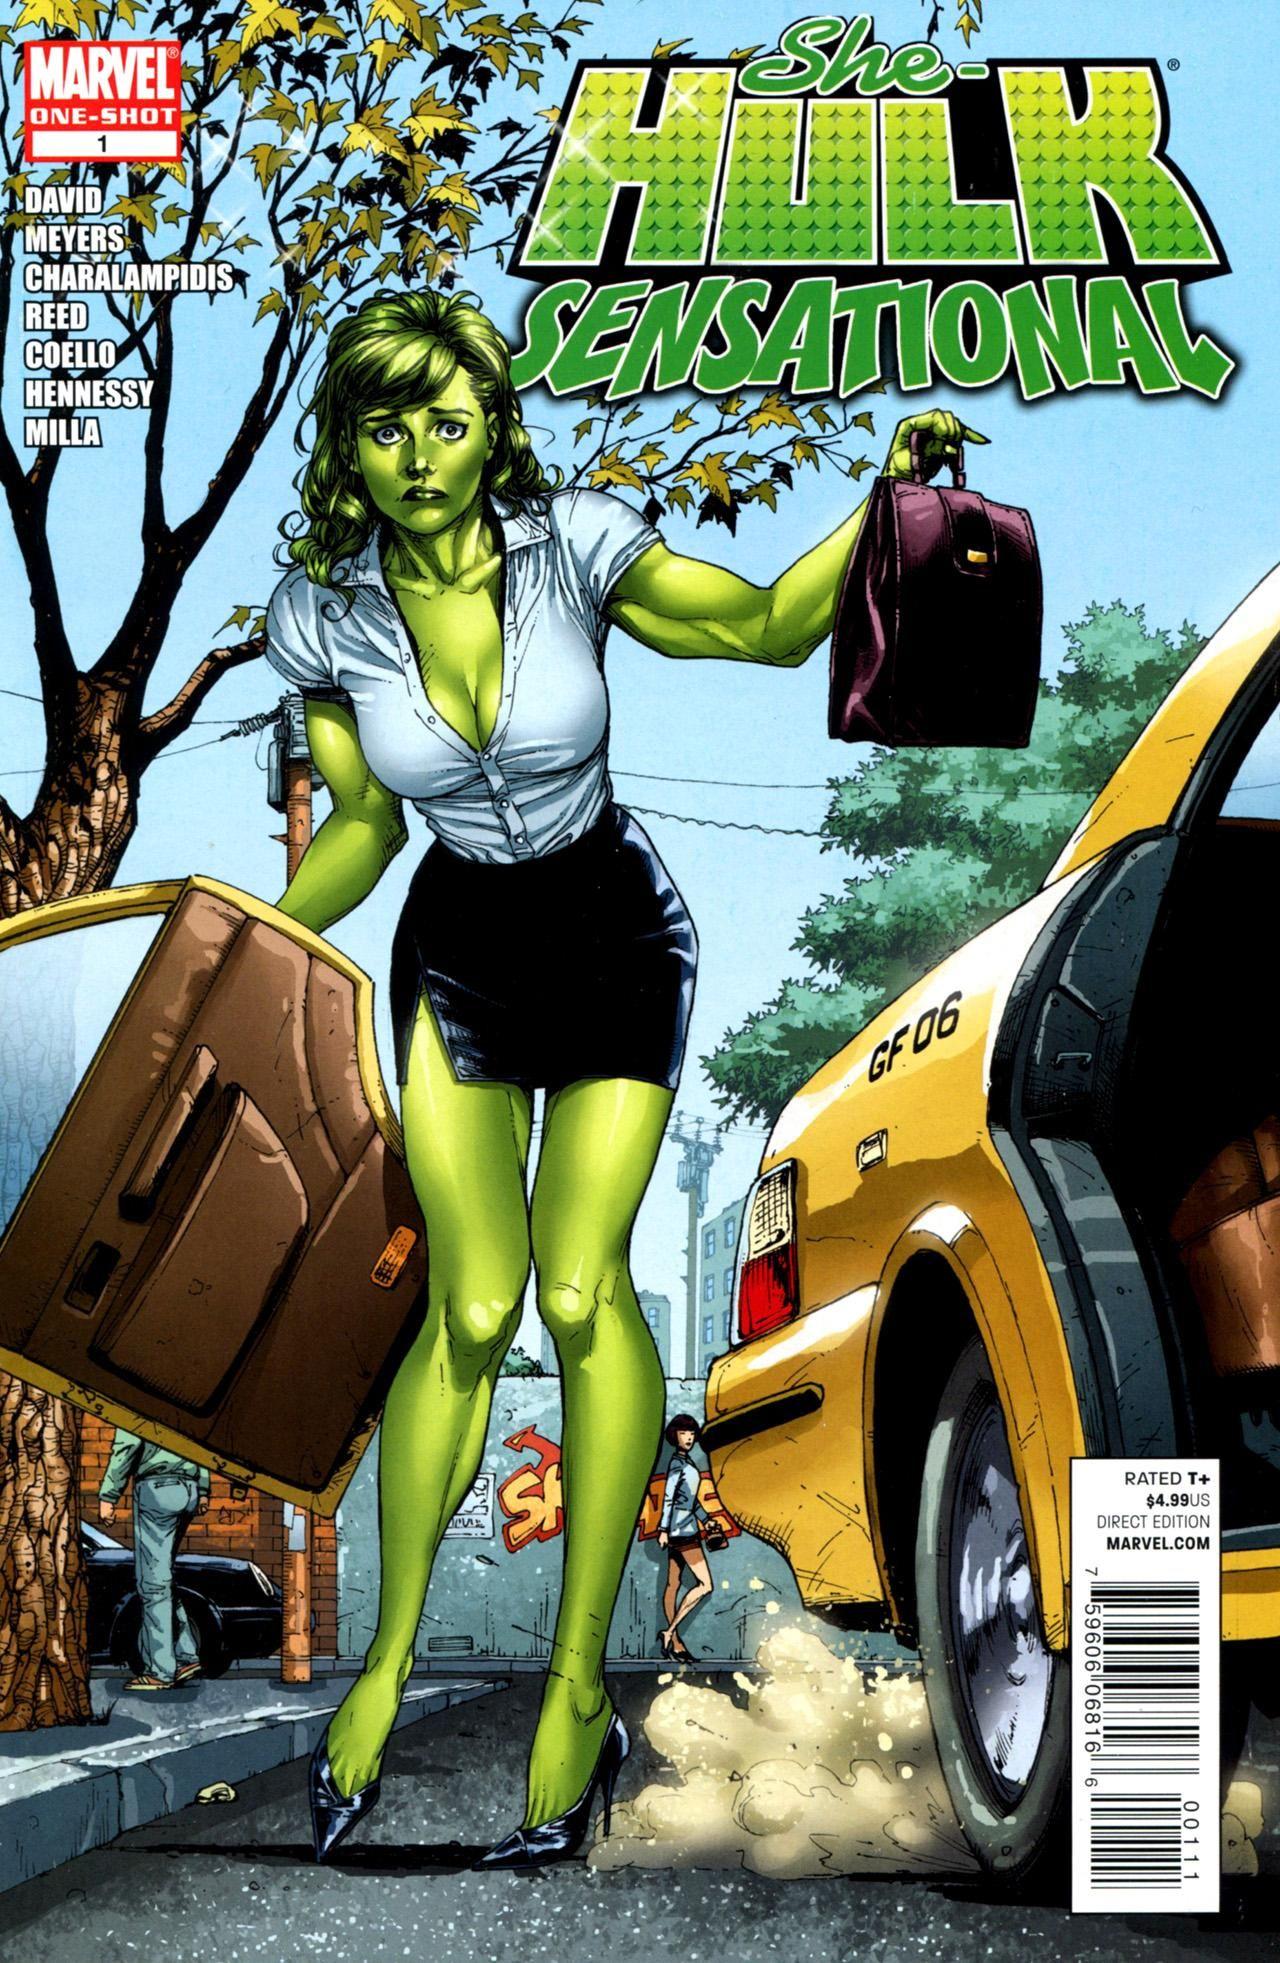 Hulk Fucks She Hulk Best sexy she hulk   she-hulk_sensational_vol_1_1   mix - 2   pinterest